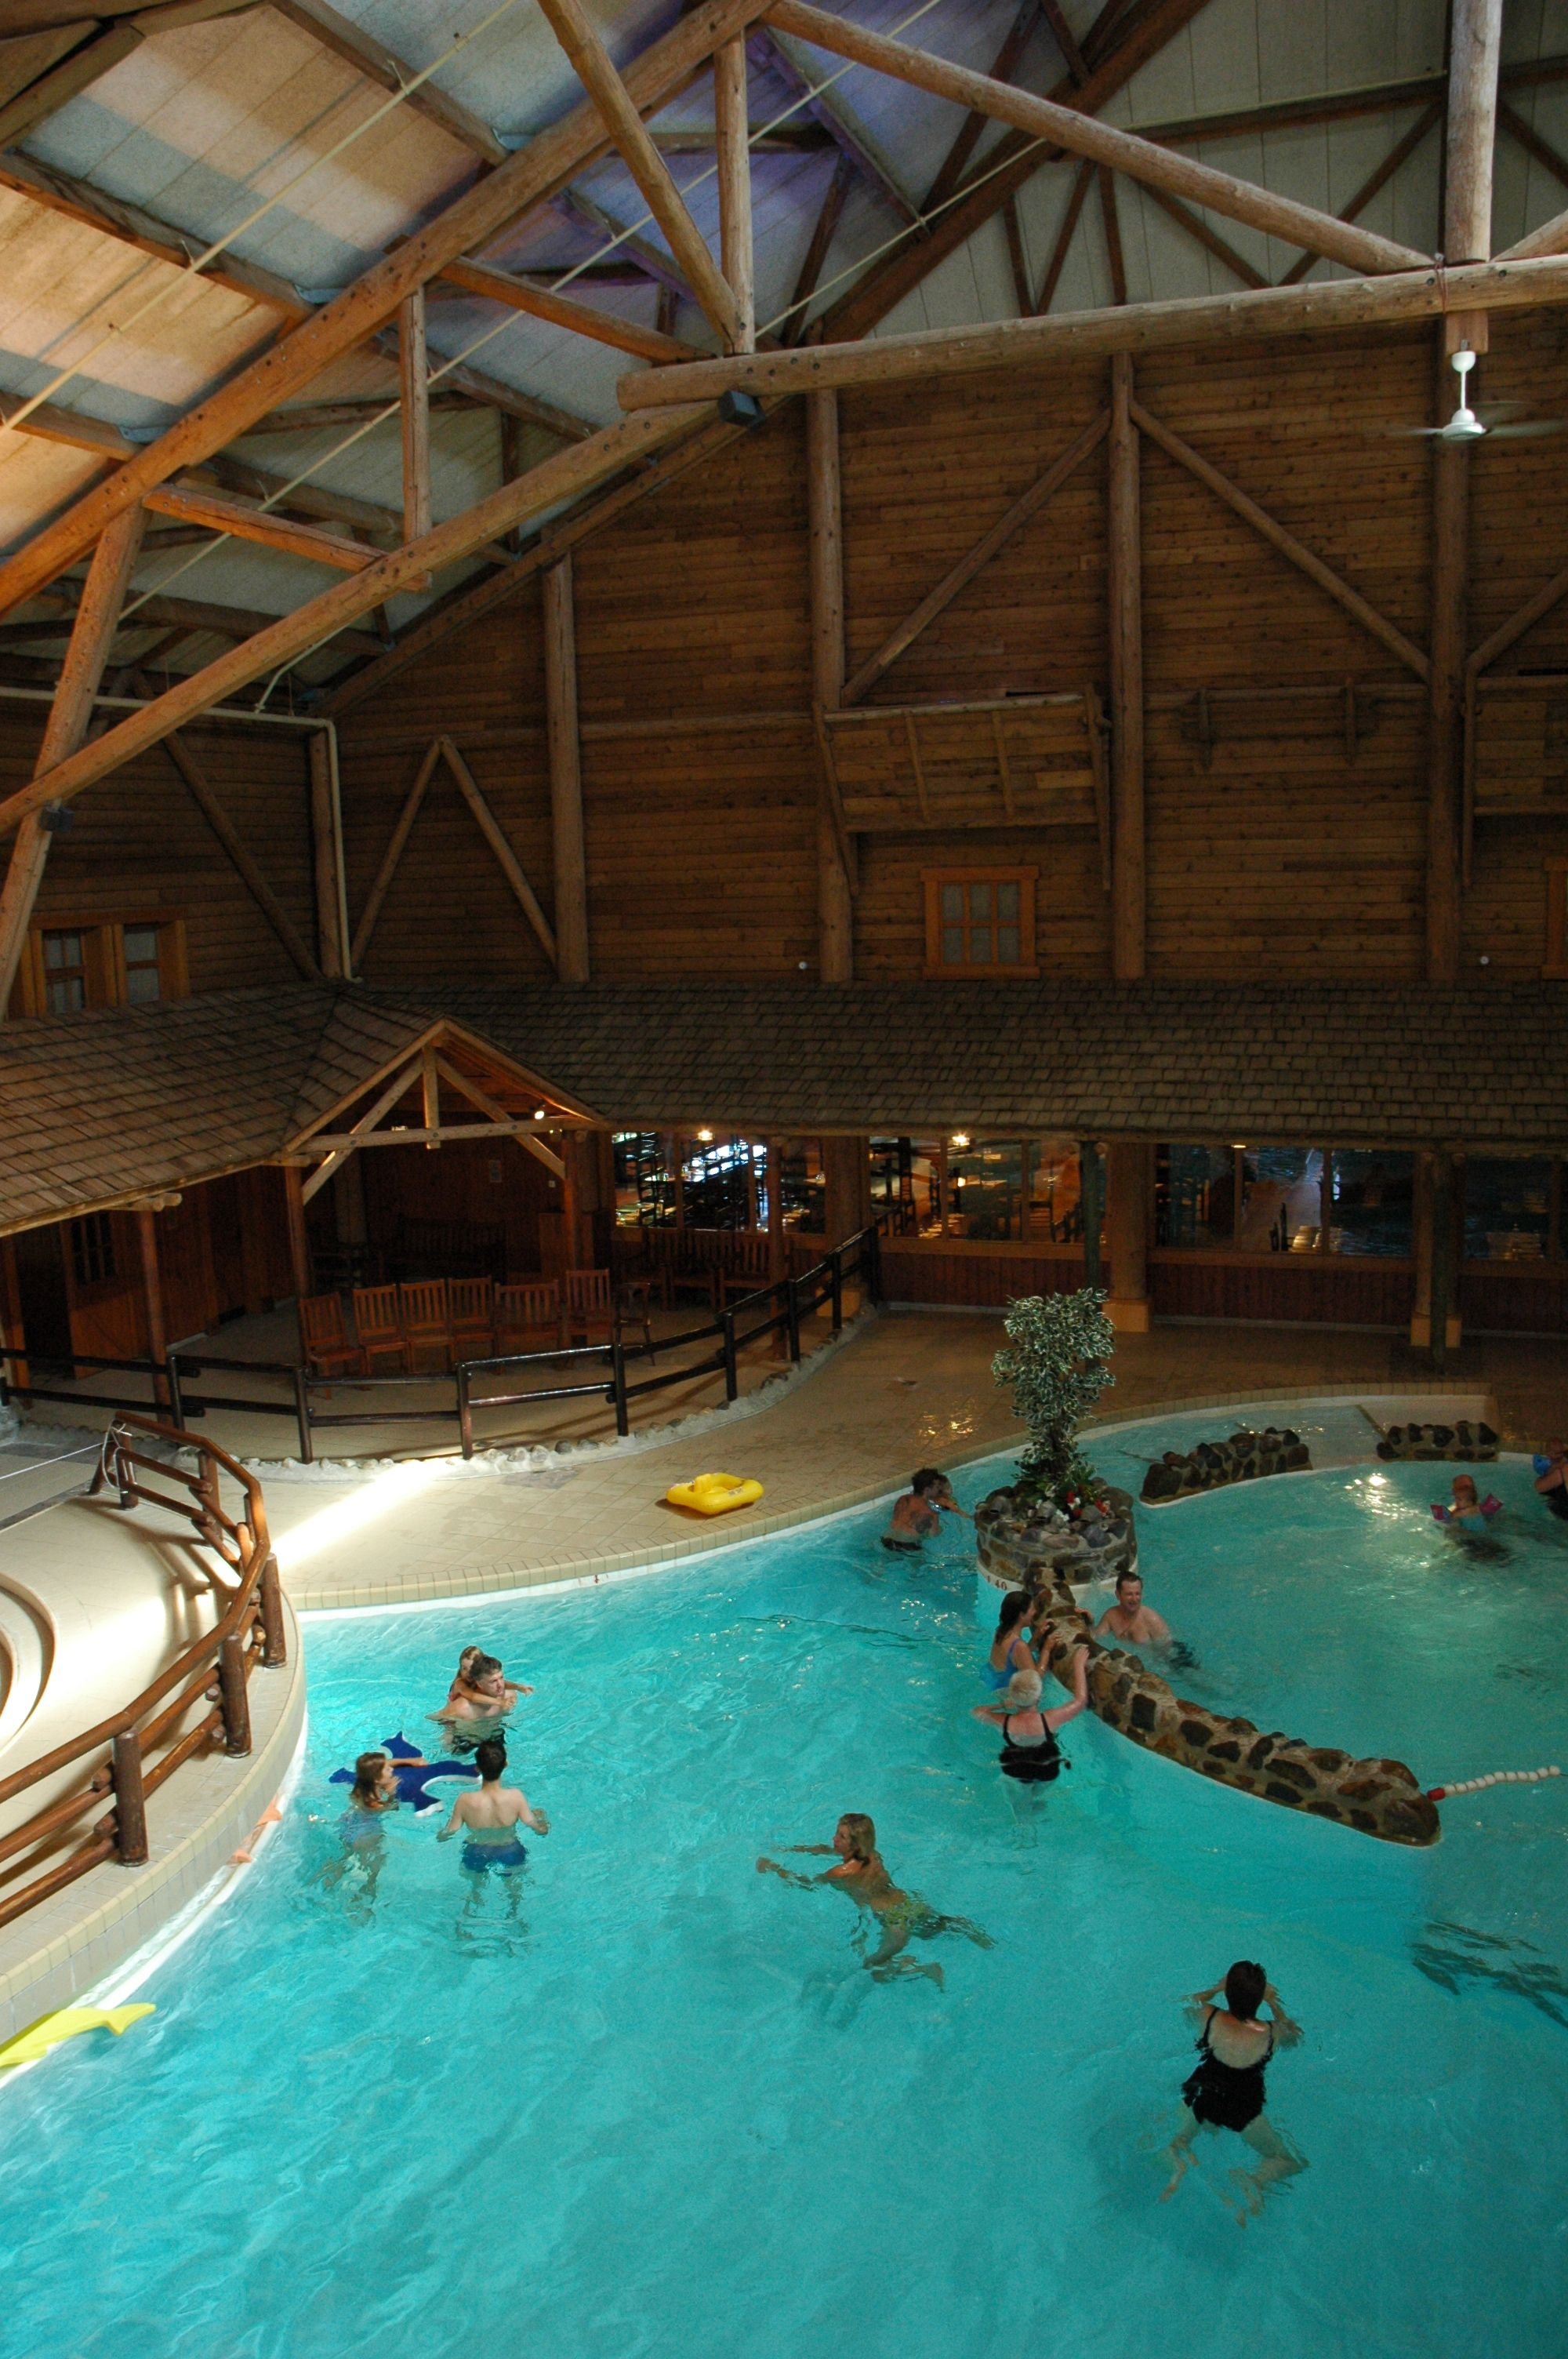 Disney Hotels Davy Crockett Ranch Indoor Pool Disneyland Paris Been There Done That Seen